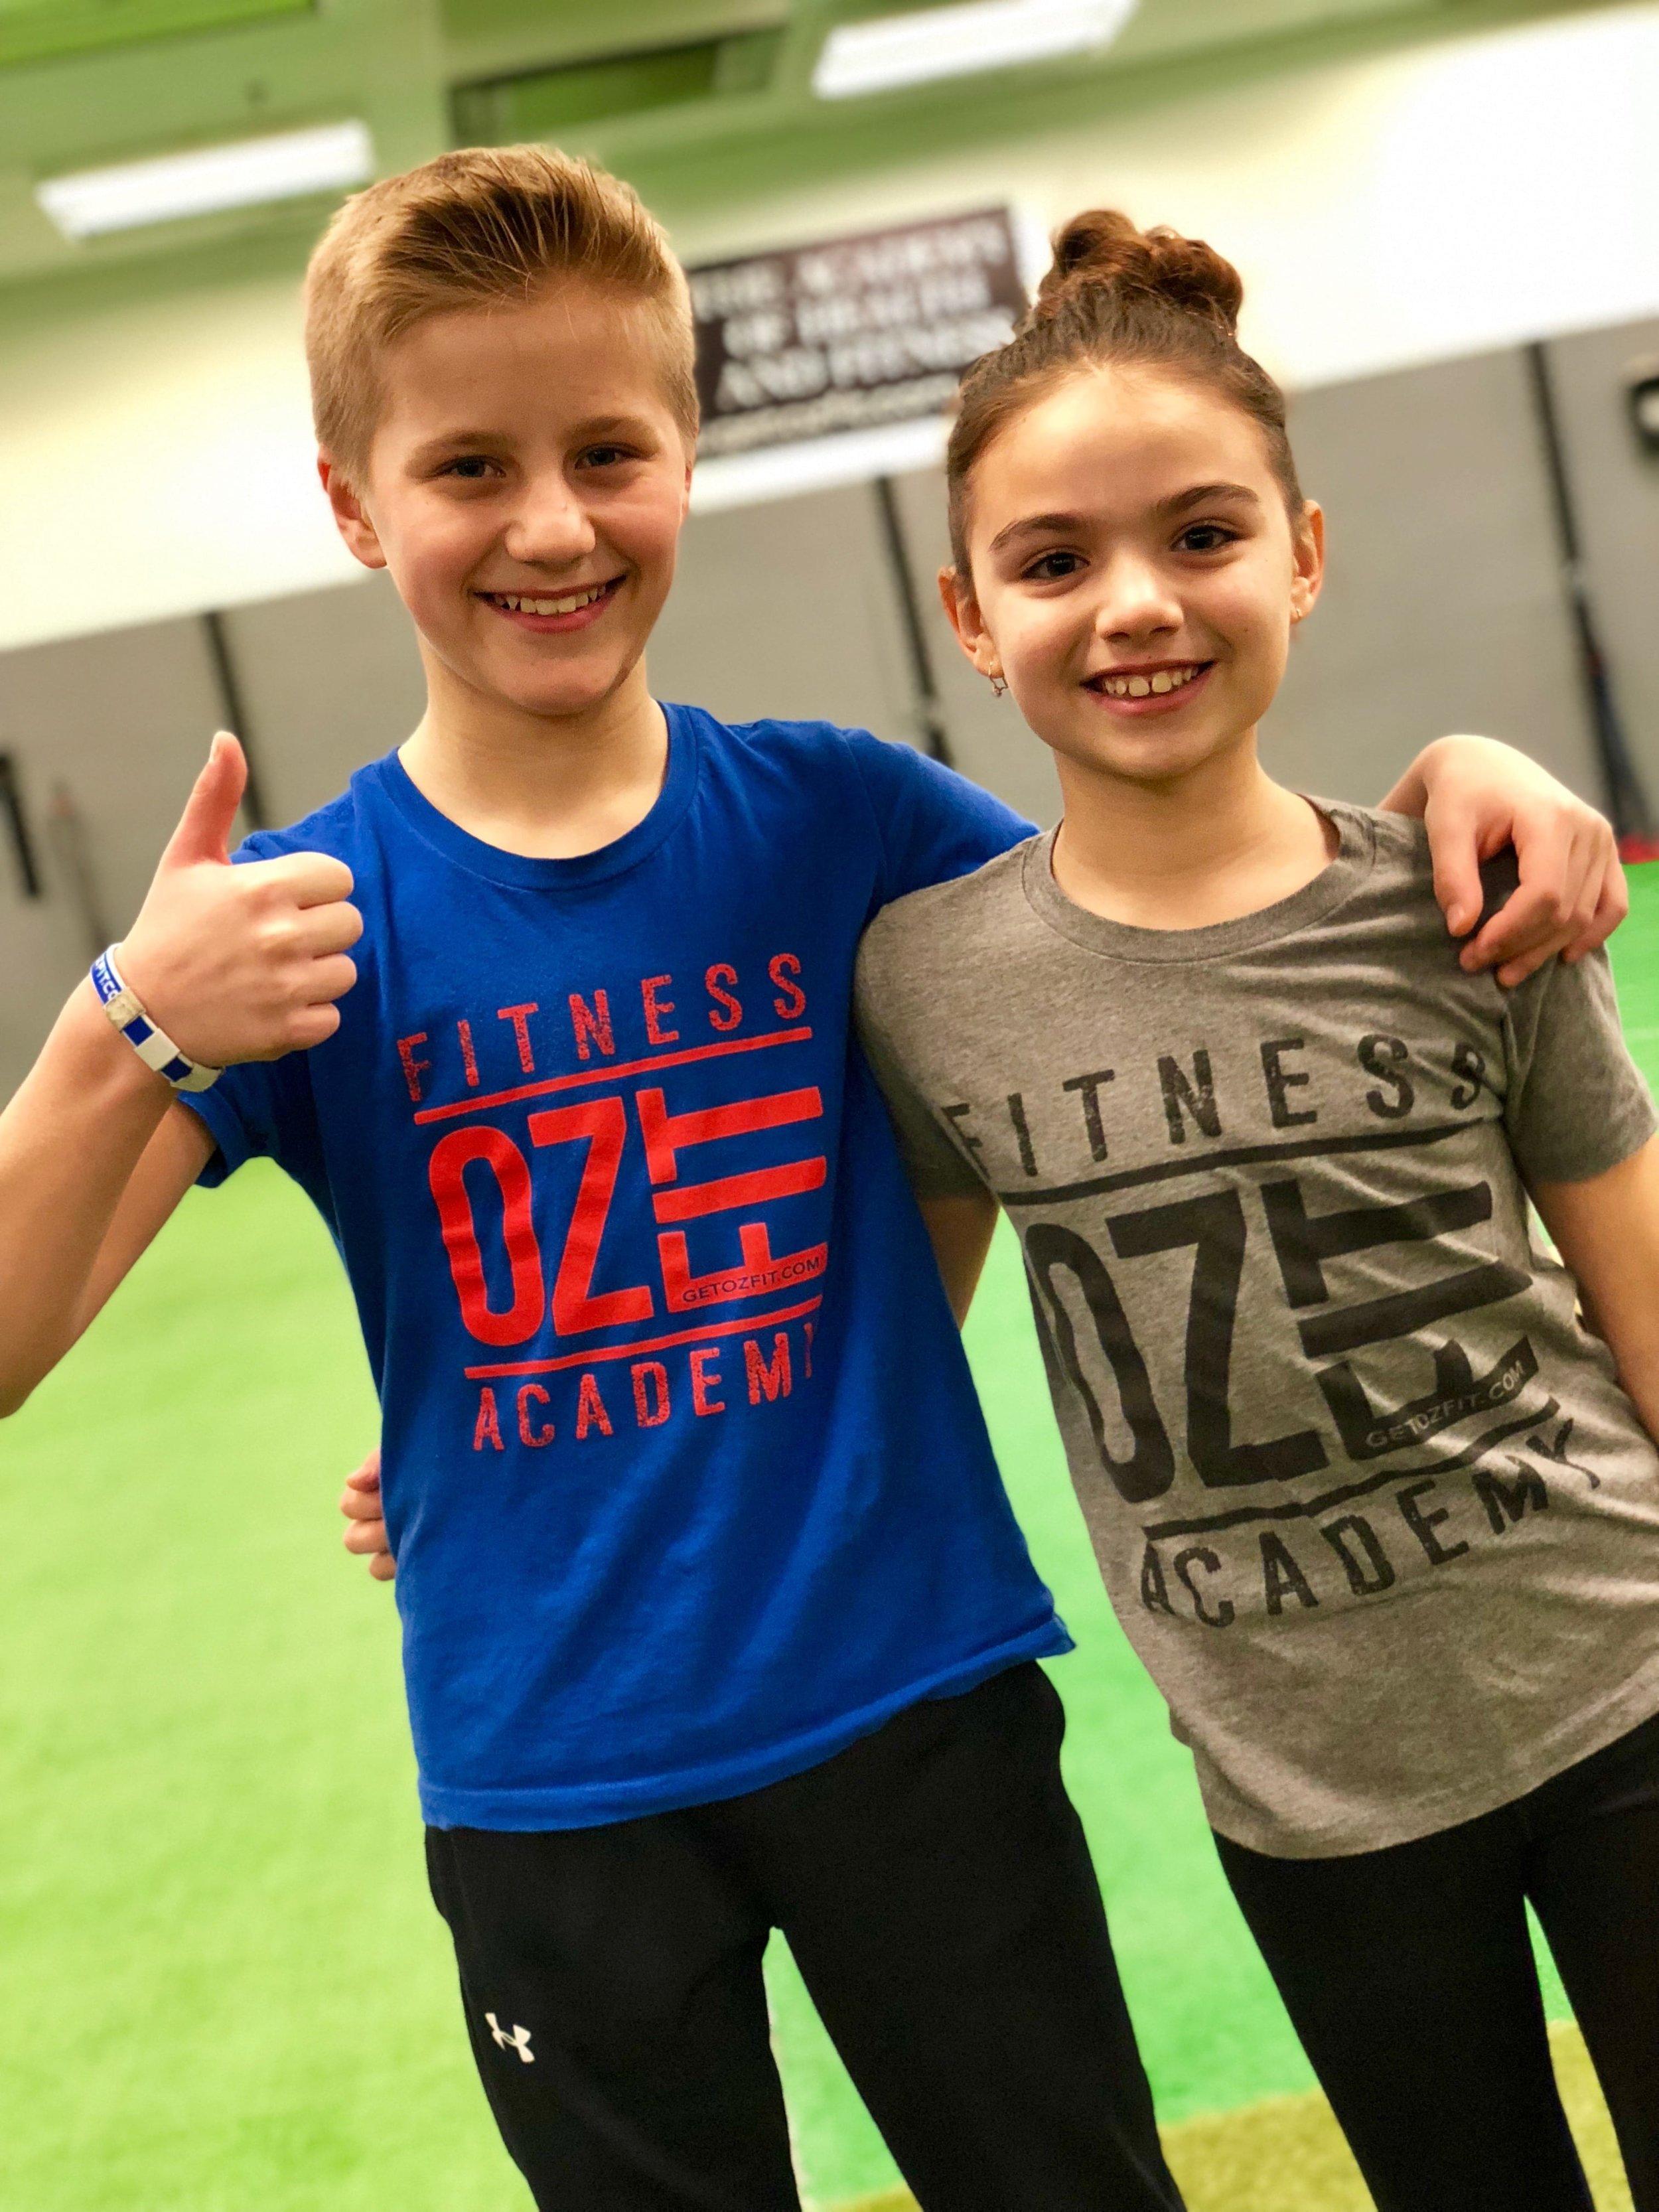 Get Oz Fit - Personal Trainer in Bergen County New Jersey - Ozzy Dugulubgov - Kids Training - Youth Fitness Program NJ (1)-min.jpeg